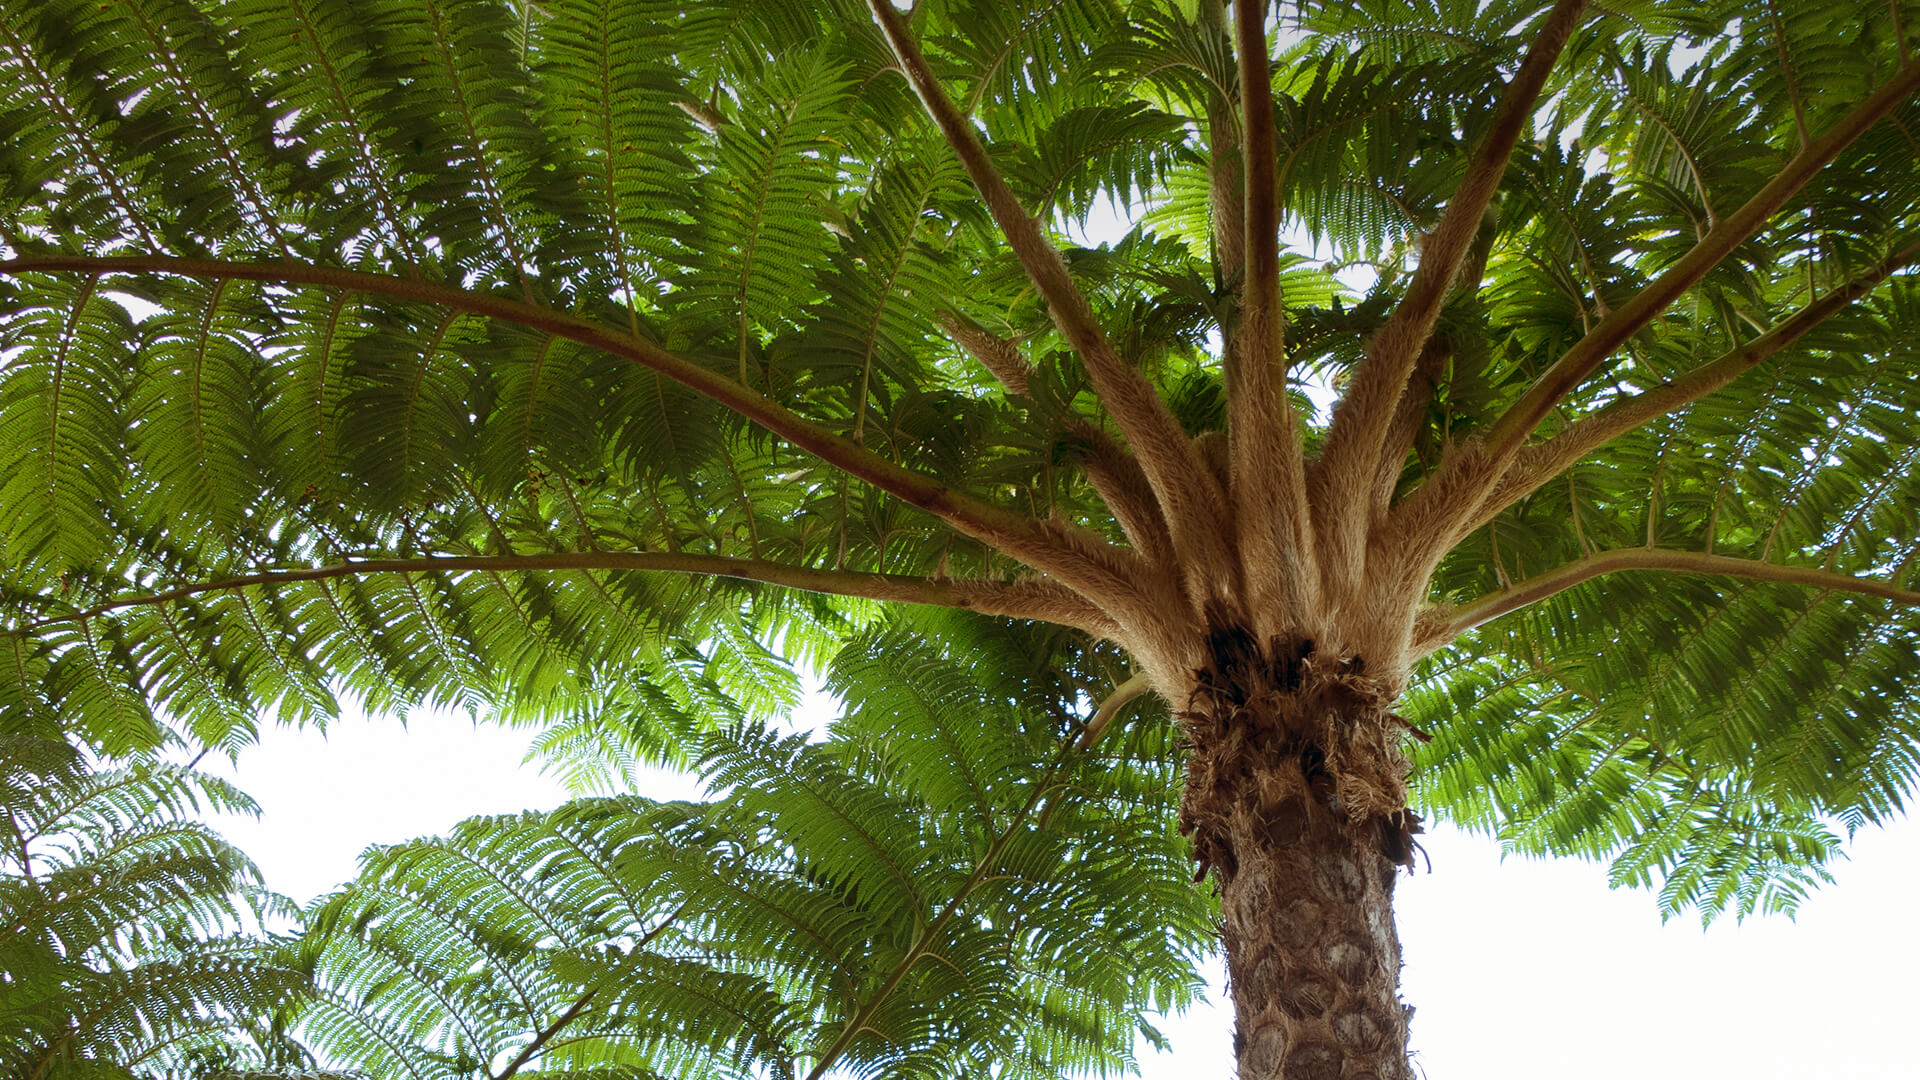 Tree Fern | San Diego Zoo Animals & Plants